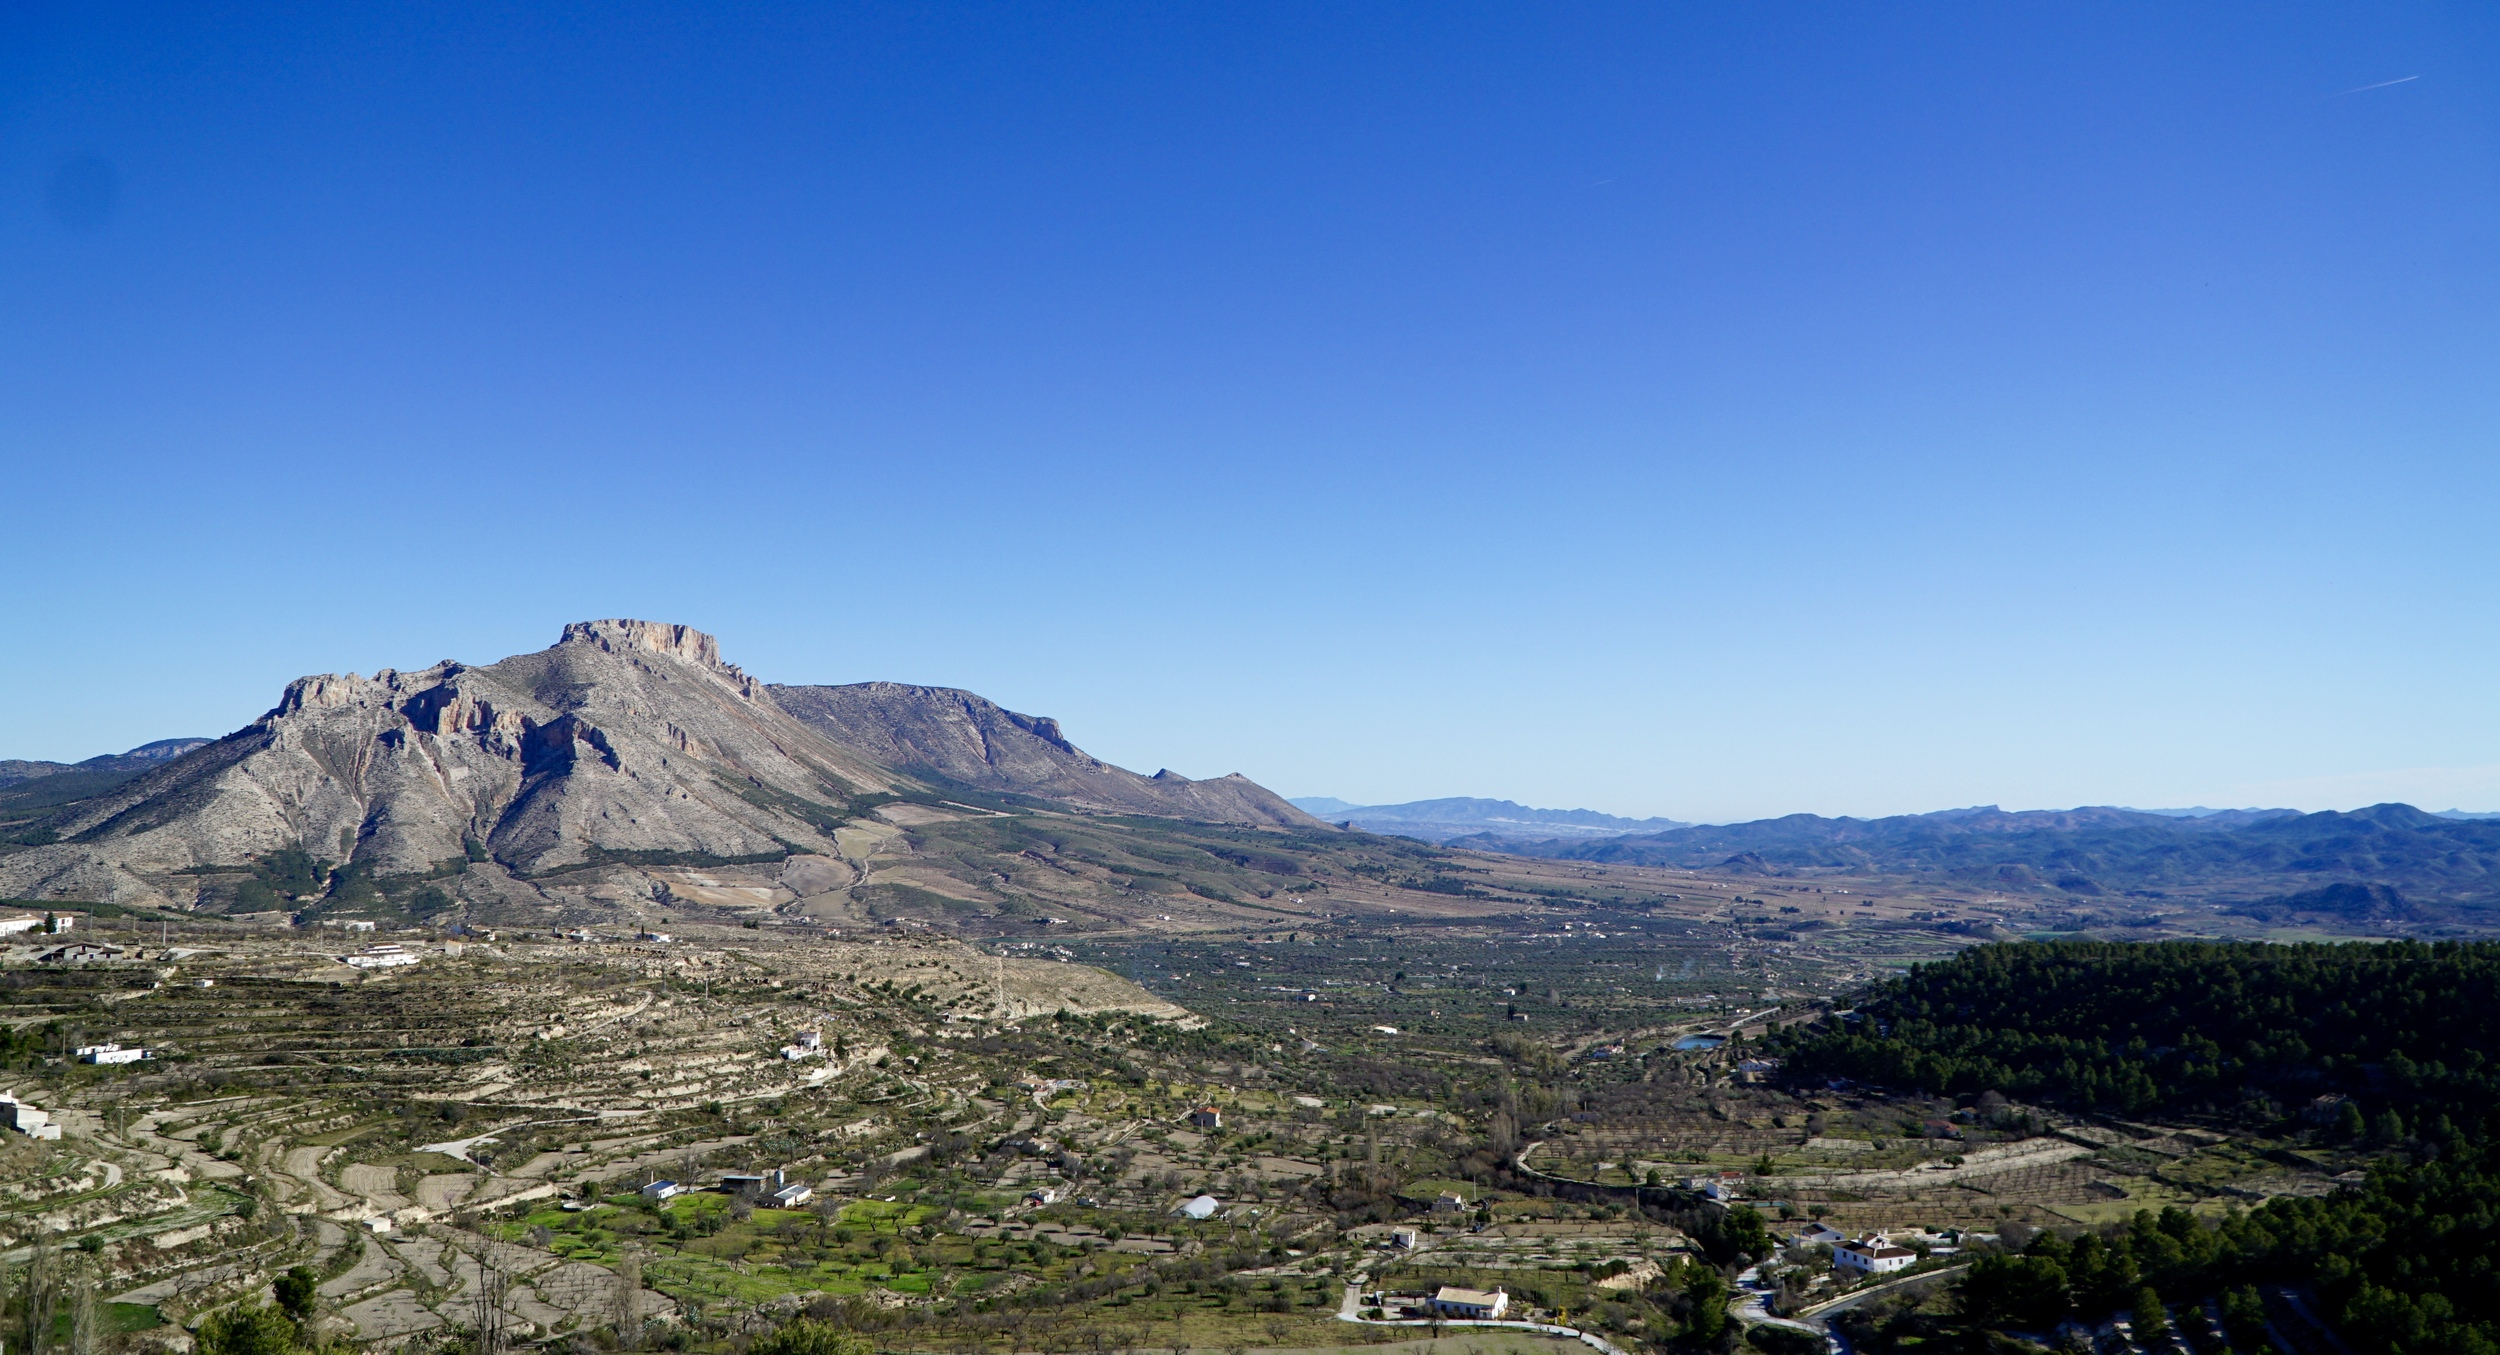 The lands around Velez Blanco